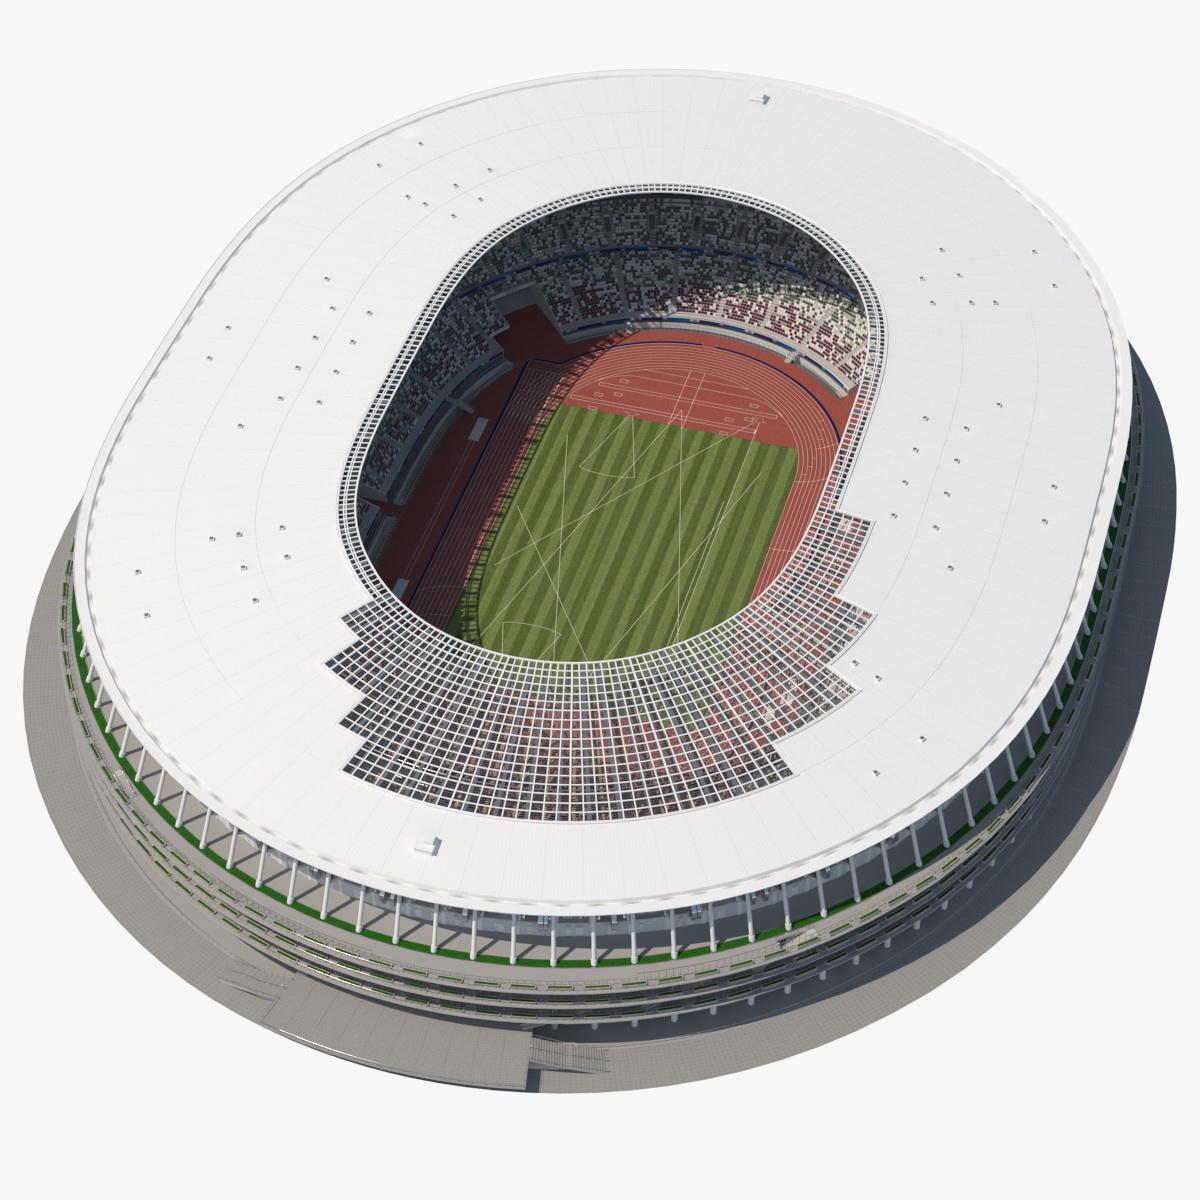 new national olympic stadium 3D